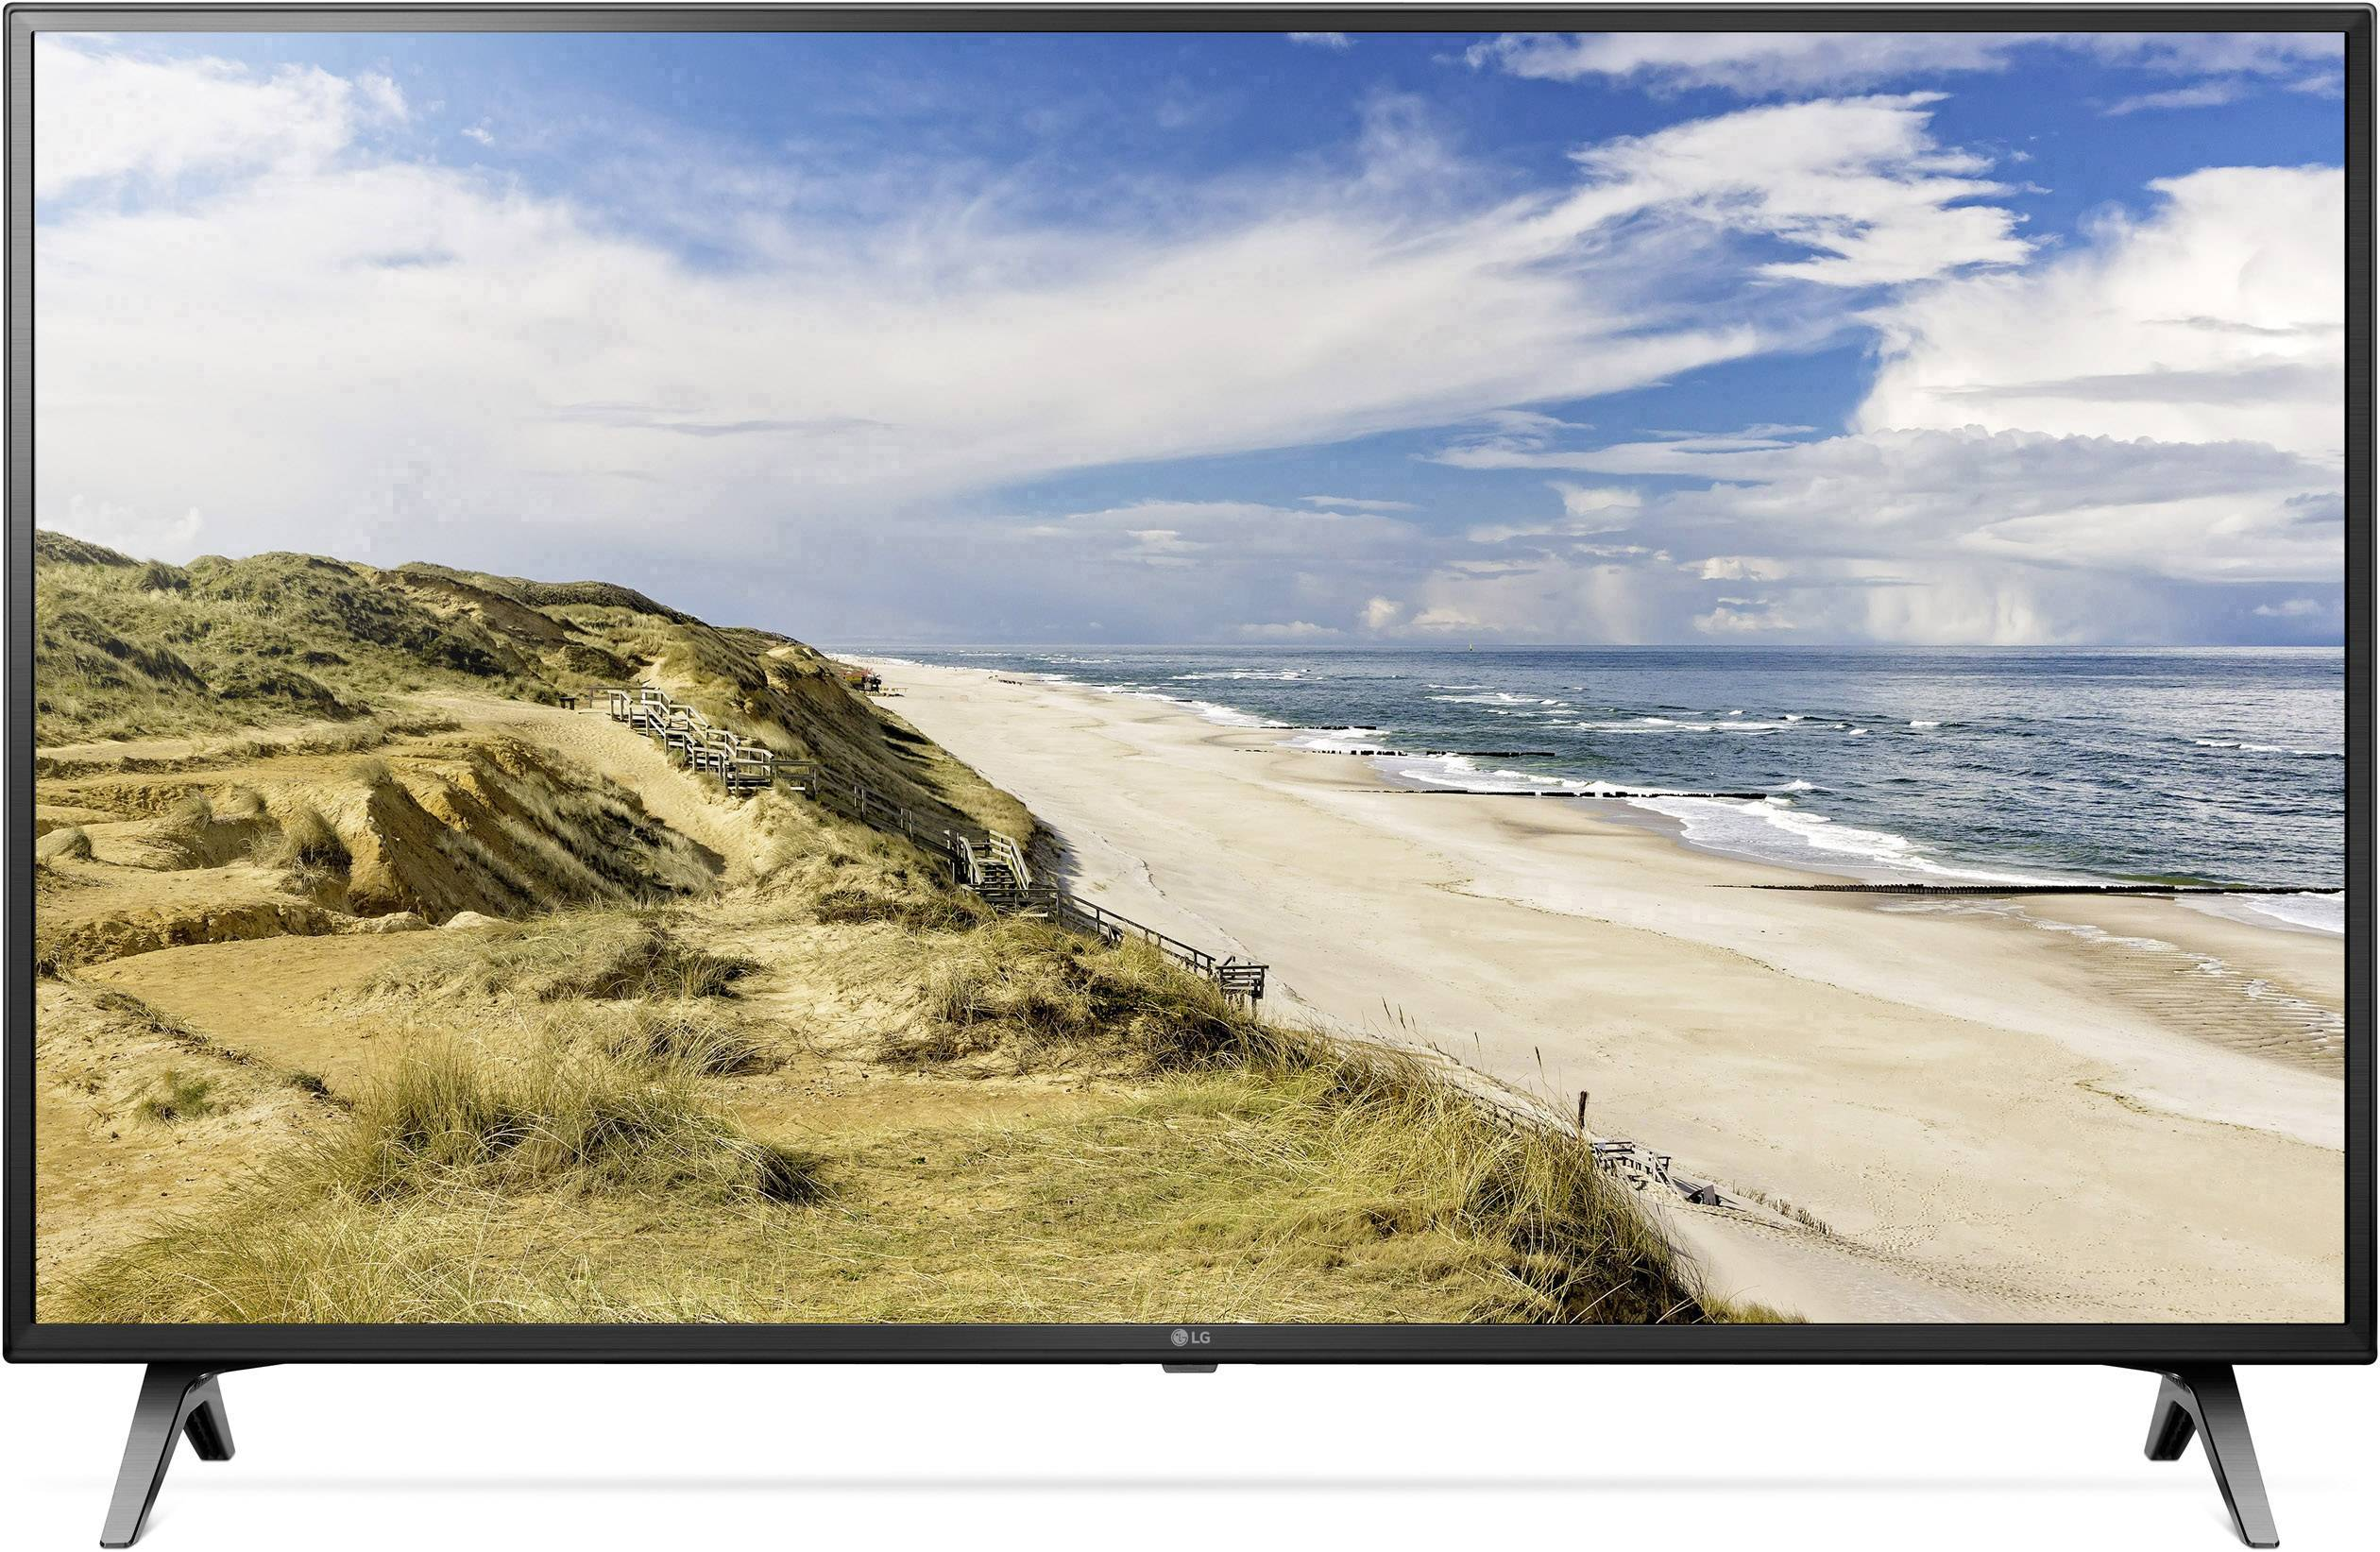 lg electronics 43um71007 led tv 108 cm 43 inch eec a a e dvb t2 dvb c dvb s uhd smart tv wi fi pvr ready ci